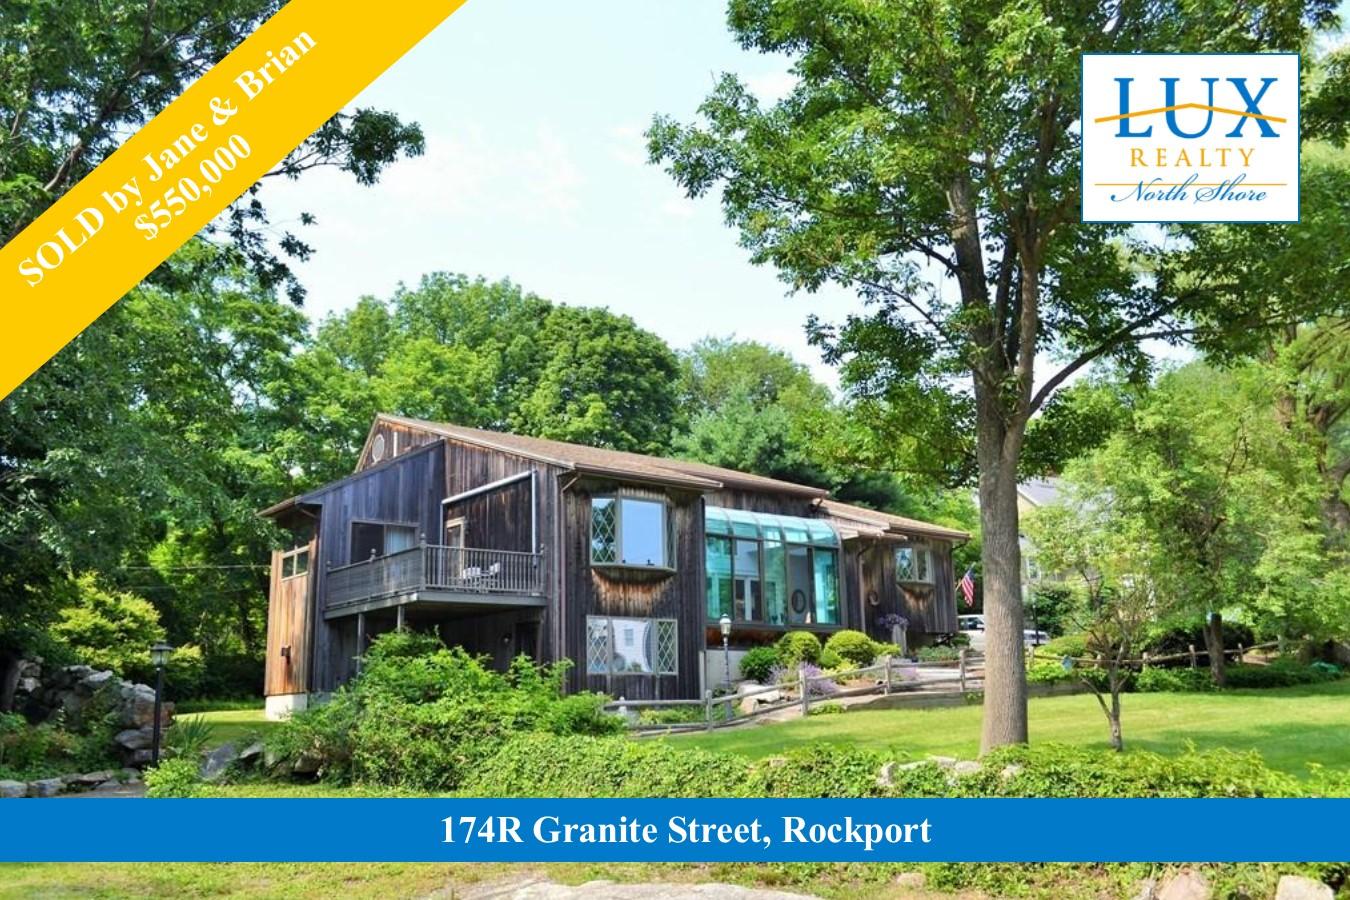 granite street rockport ma